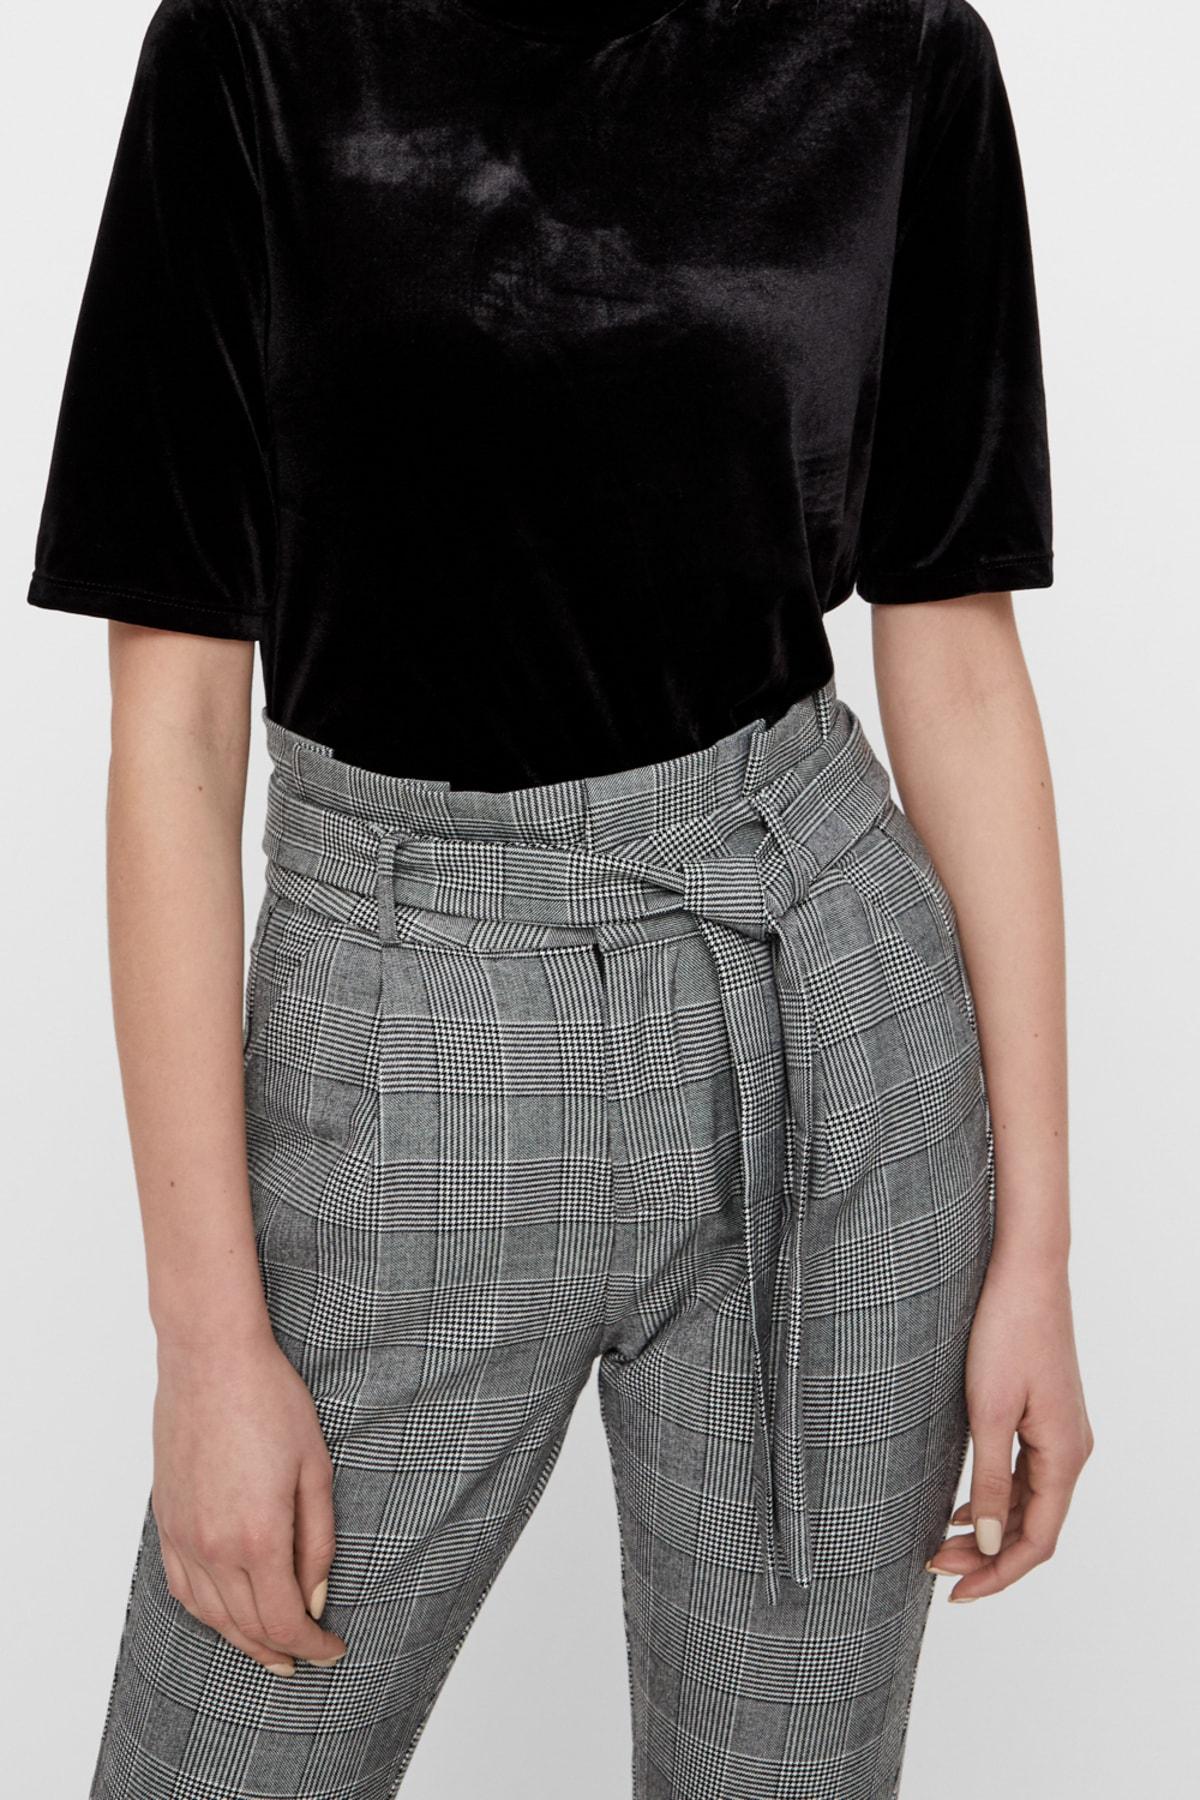 Vero Moda Kadın Gri Kareli Paperbag Bel Kumaş Pantolon 10209834 VMEVA 2